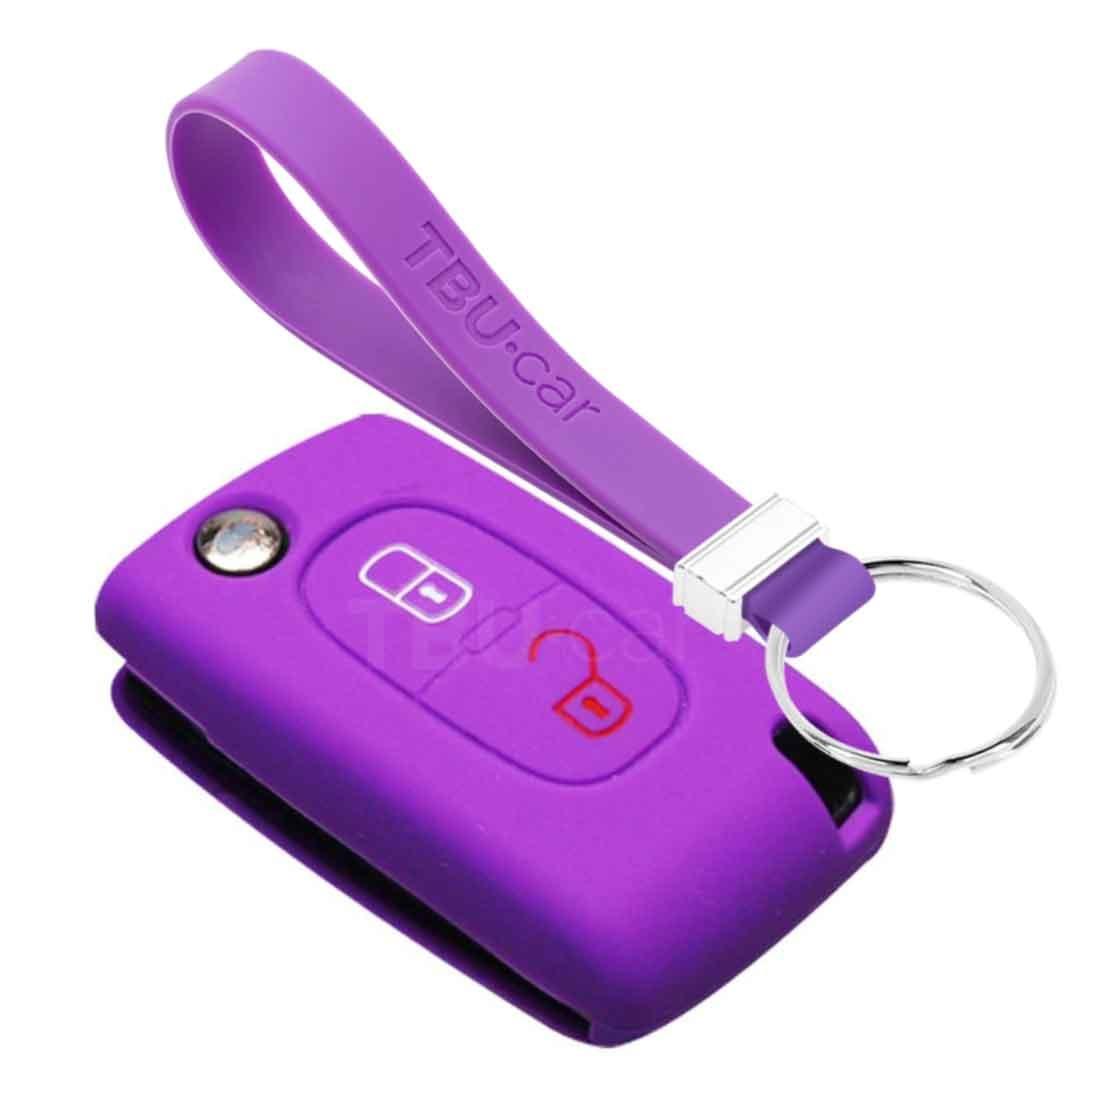 TBU car TBU car Autoschlüssel Hülle kompatibel mit Citroën 2 Tasten - Schutzhülle aus Silikon - Auto Schlüsselhülle Cover in Violett